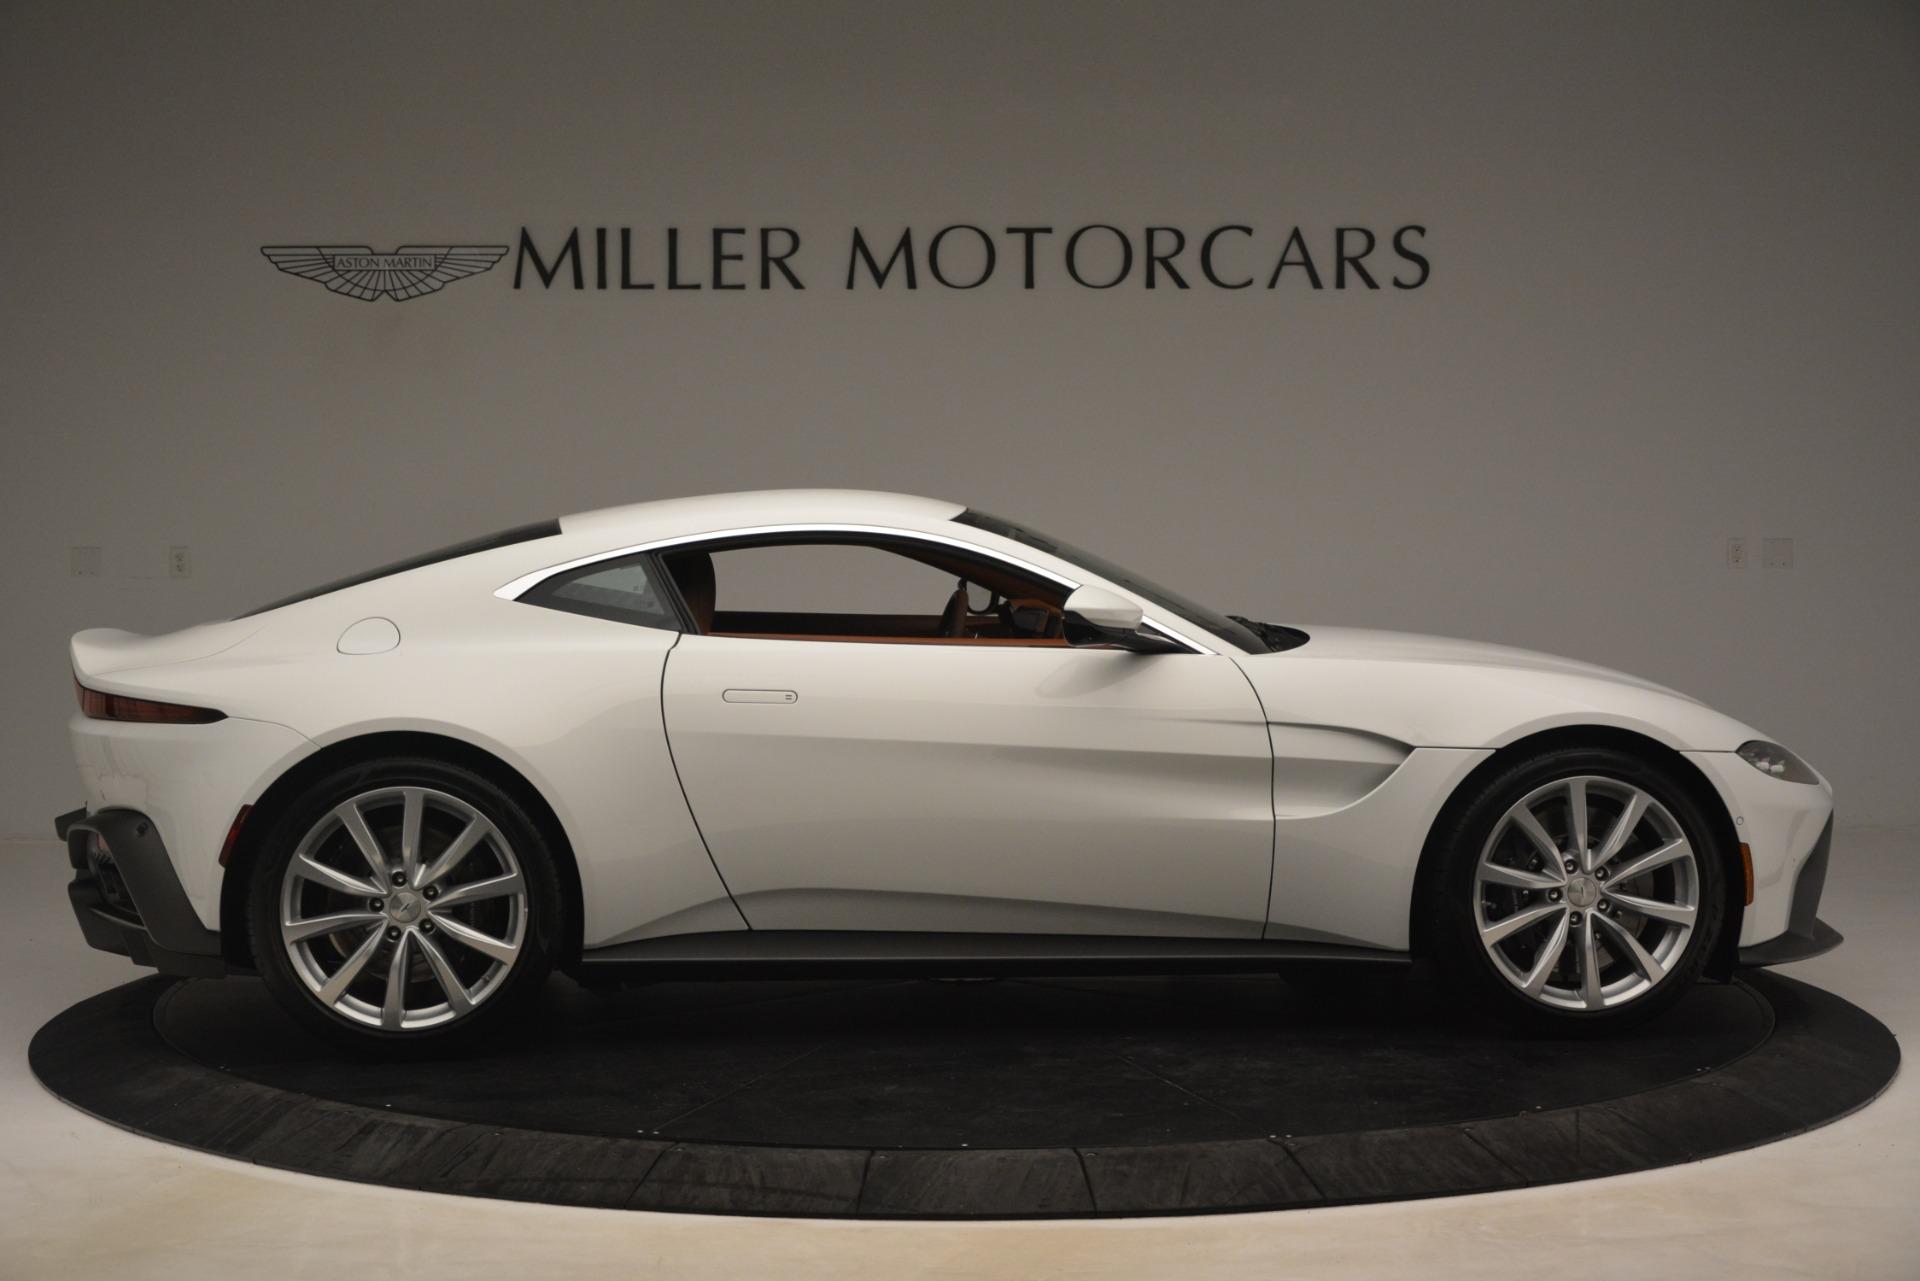 New 2019 Aston Martin Vantage Coupe For Sale In Greenwich, CT. Alfa Romeo of Greenwich, A1373 3227_p8